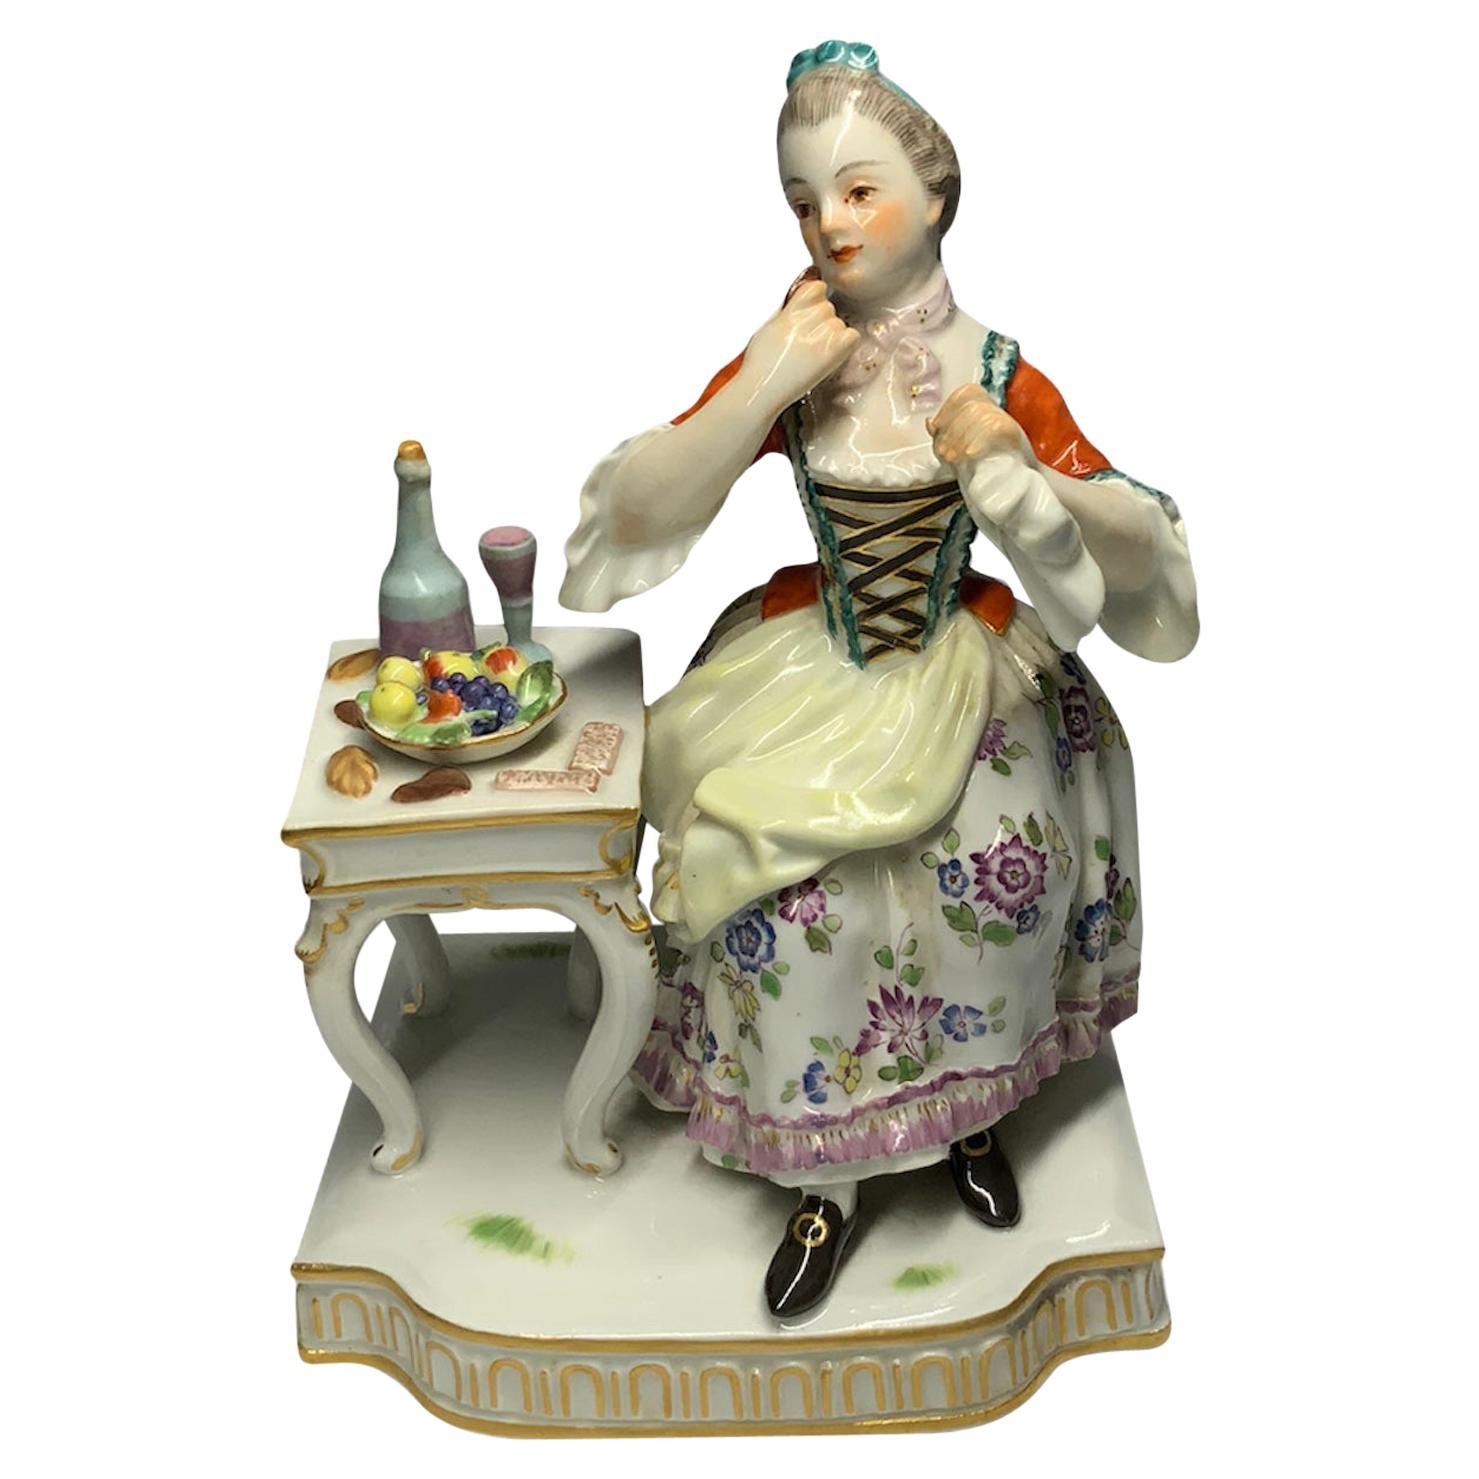 Meissen Porcelain Lady Figurine Enjoying a Meal